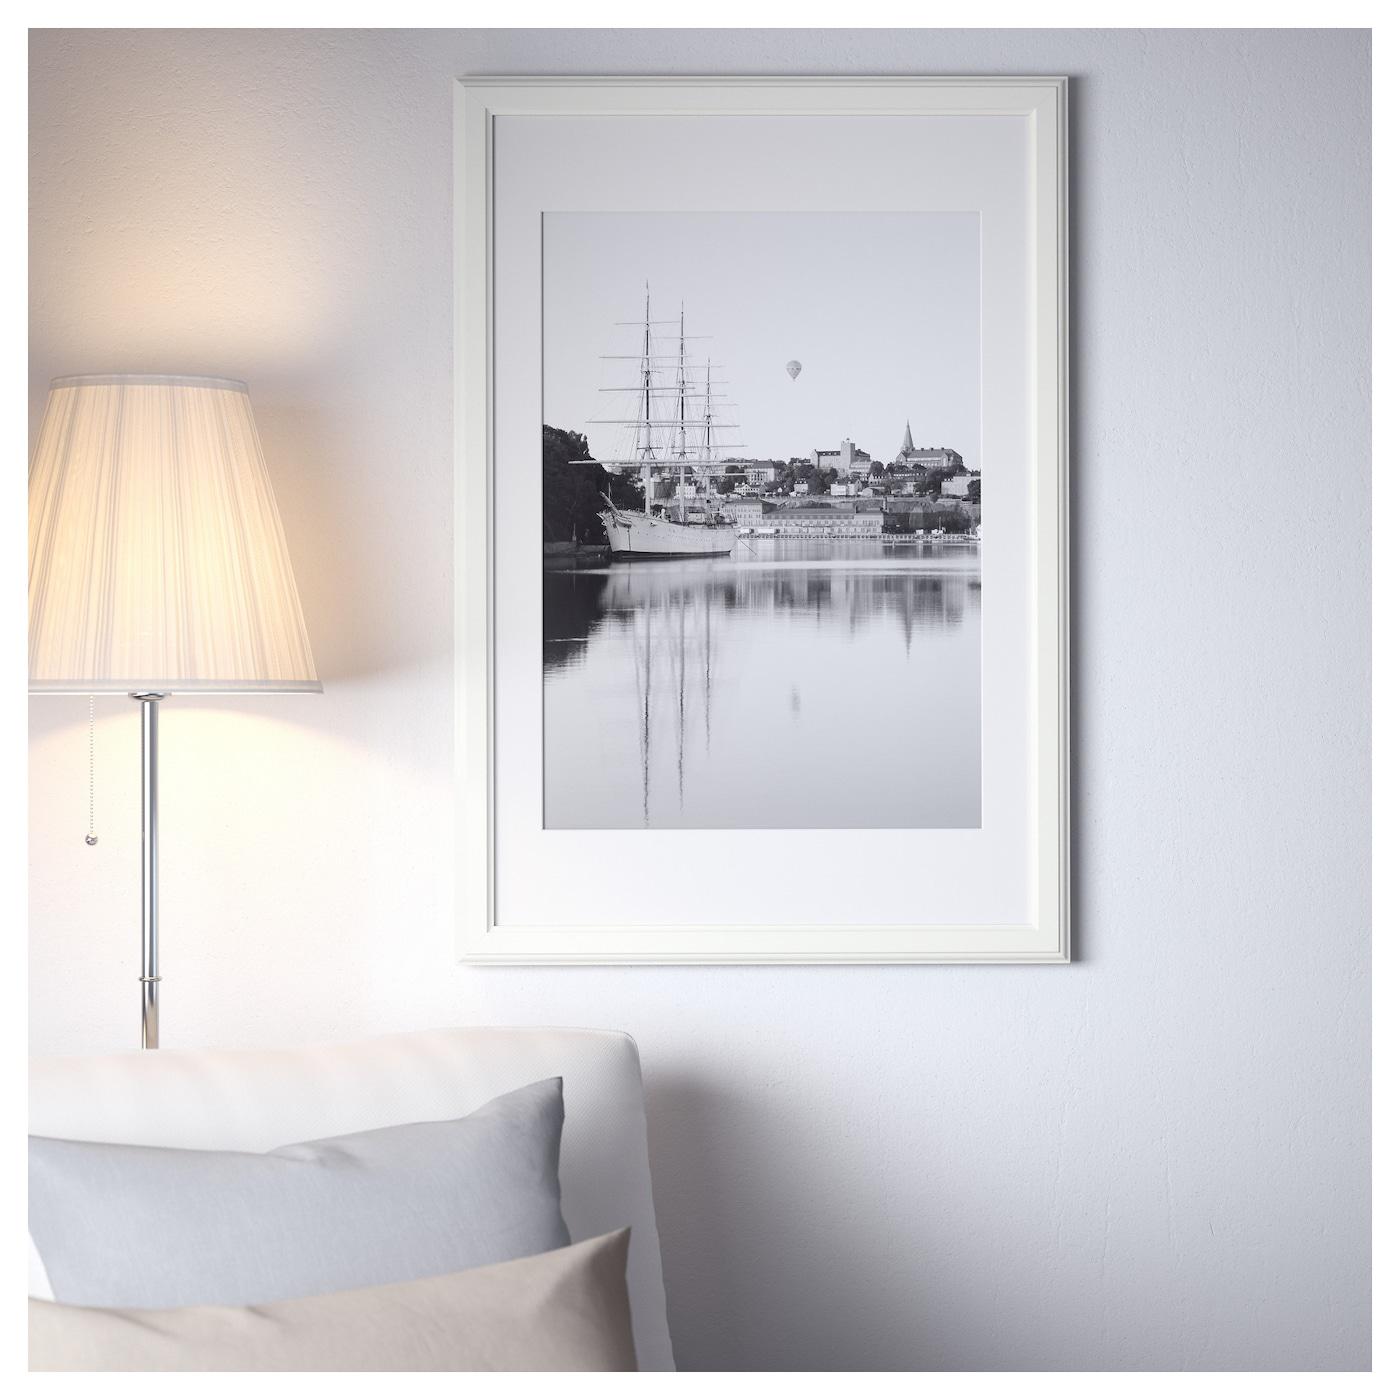 virserum frame white 61 x 91 cm ikea. Black Bedroom Furniture Sets. Home Design Ideas